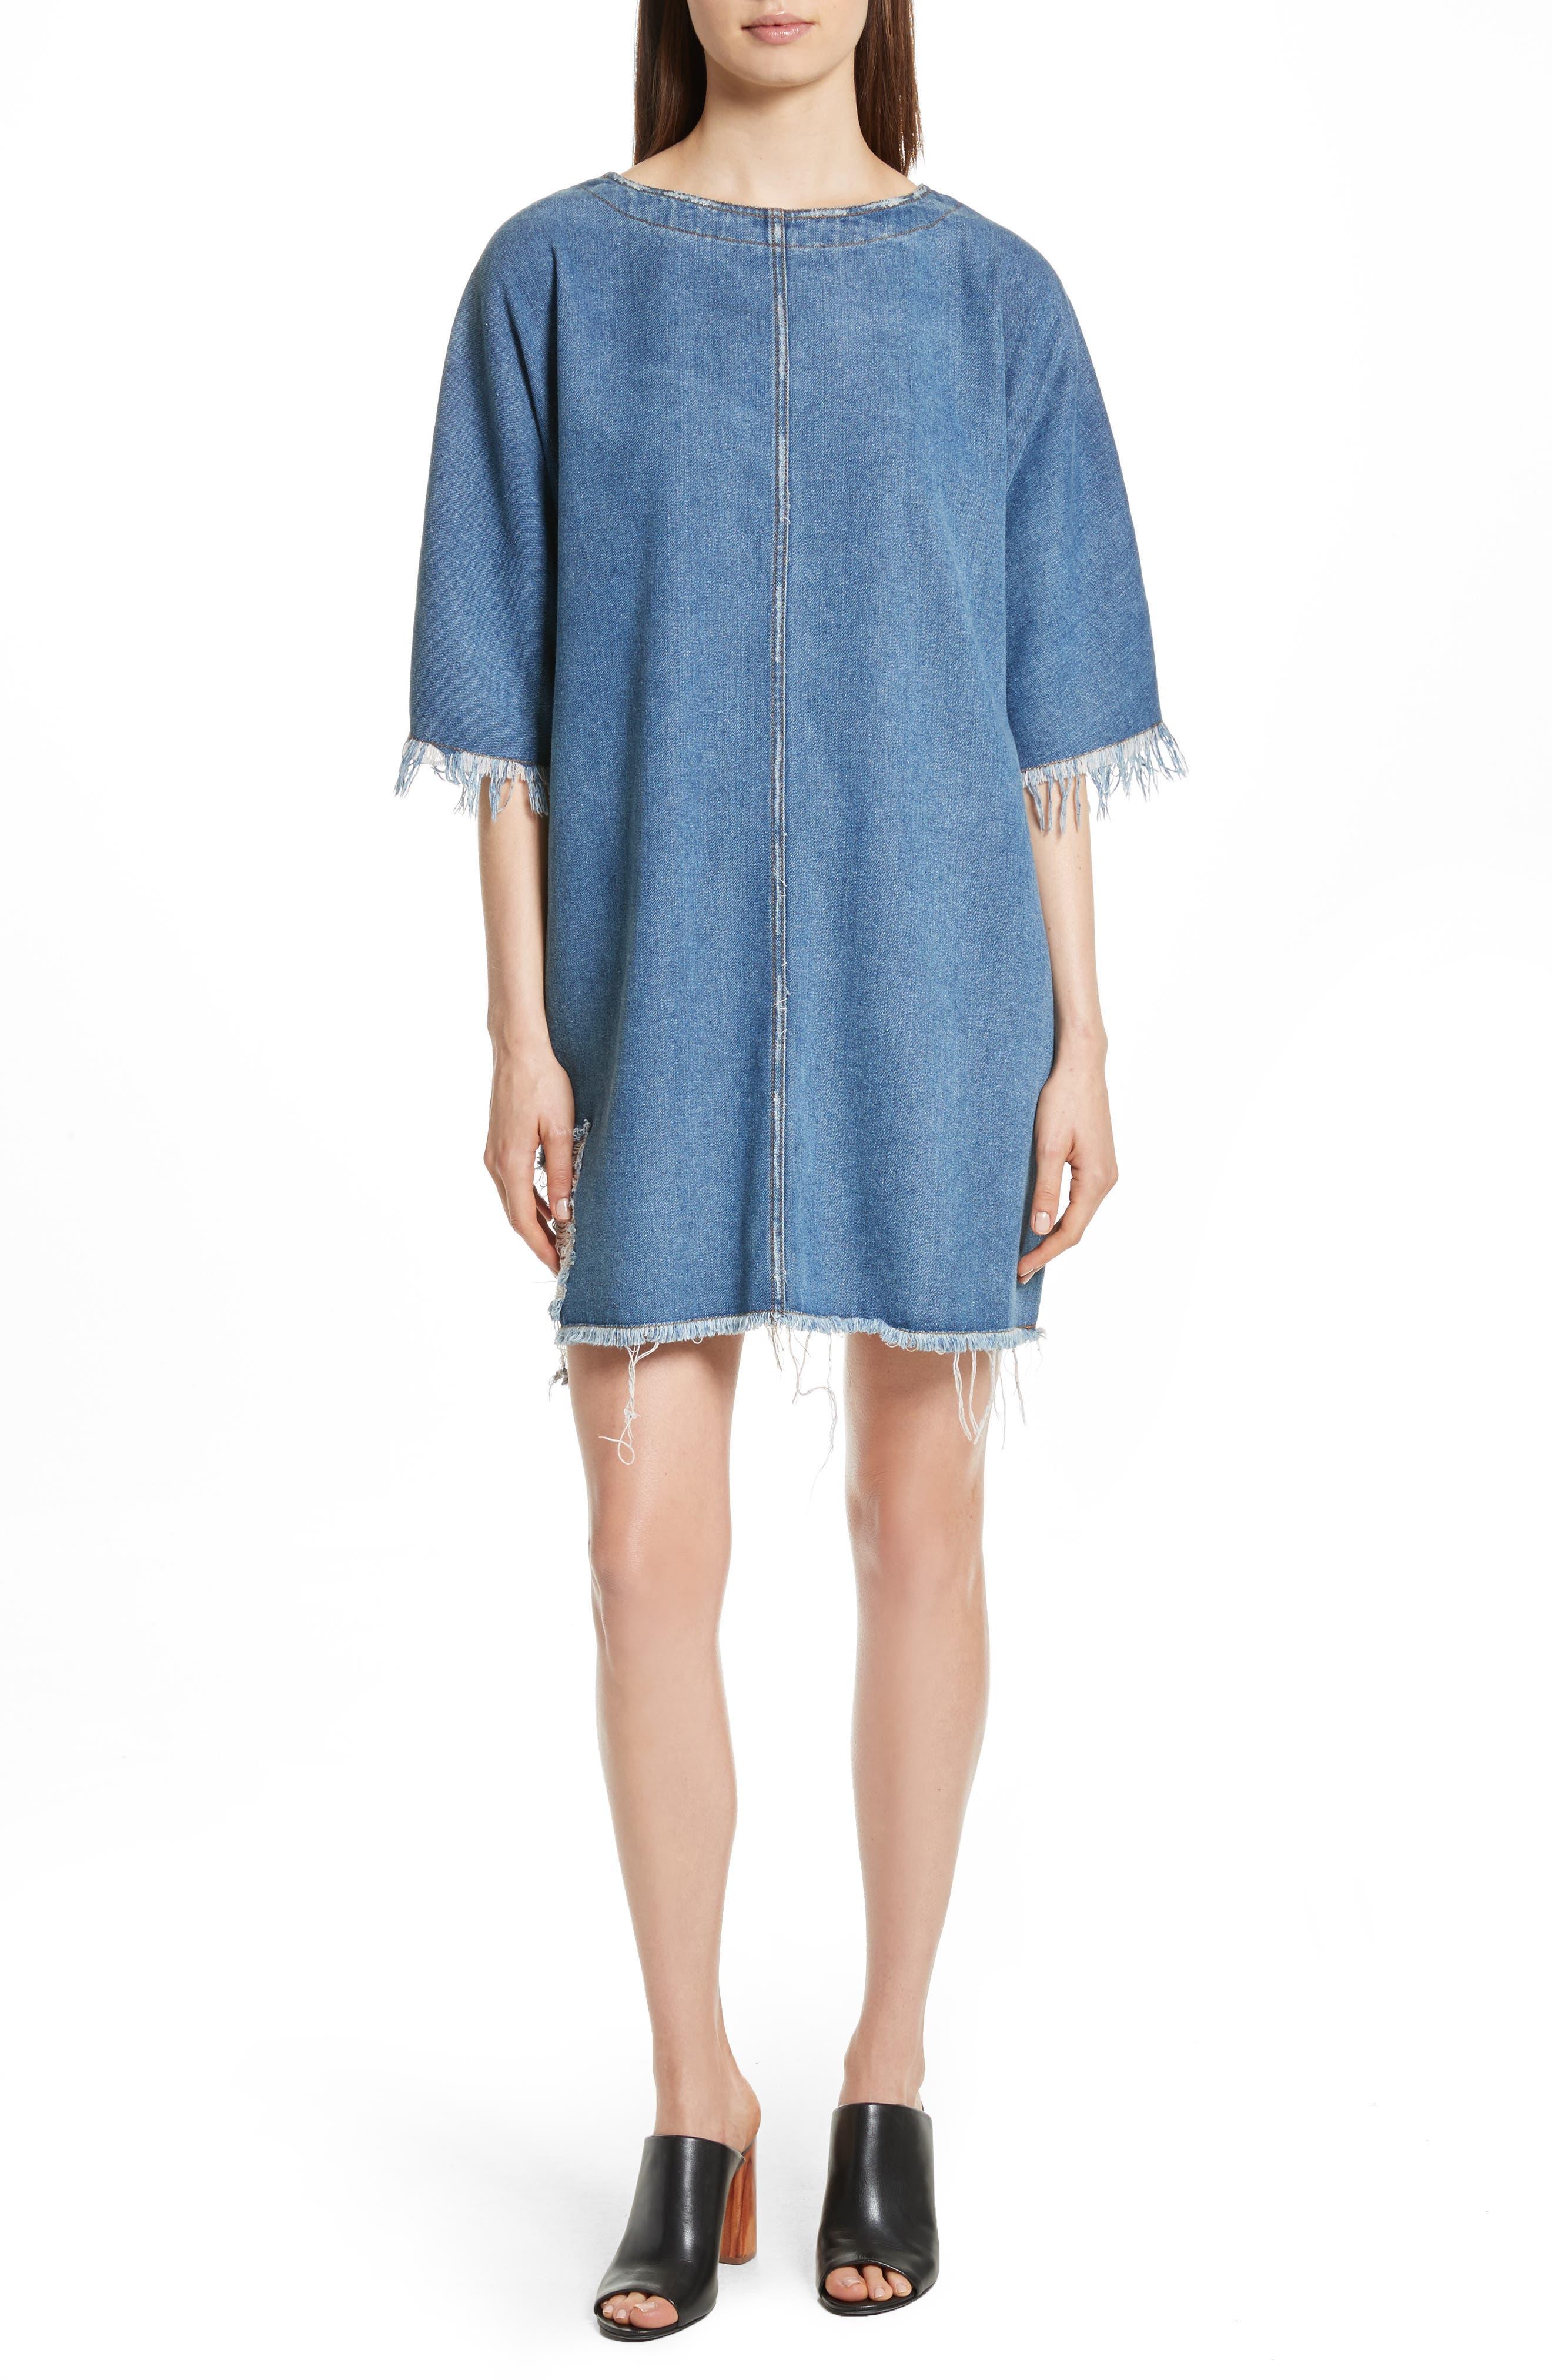 Distressed Denim Dress,                             Main thumbnail 1, color,                             400